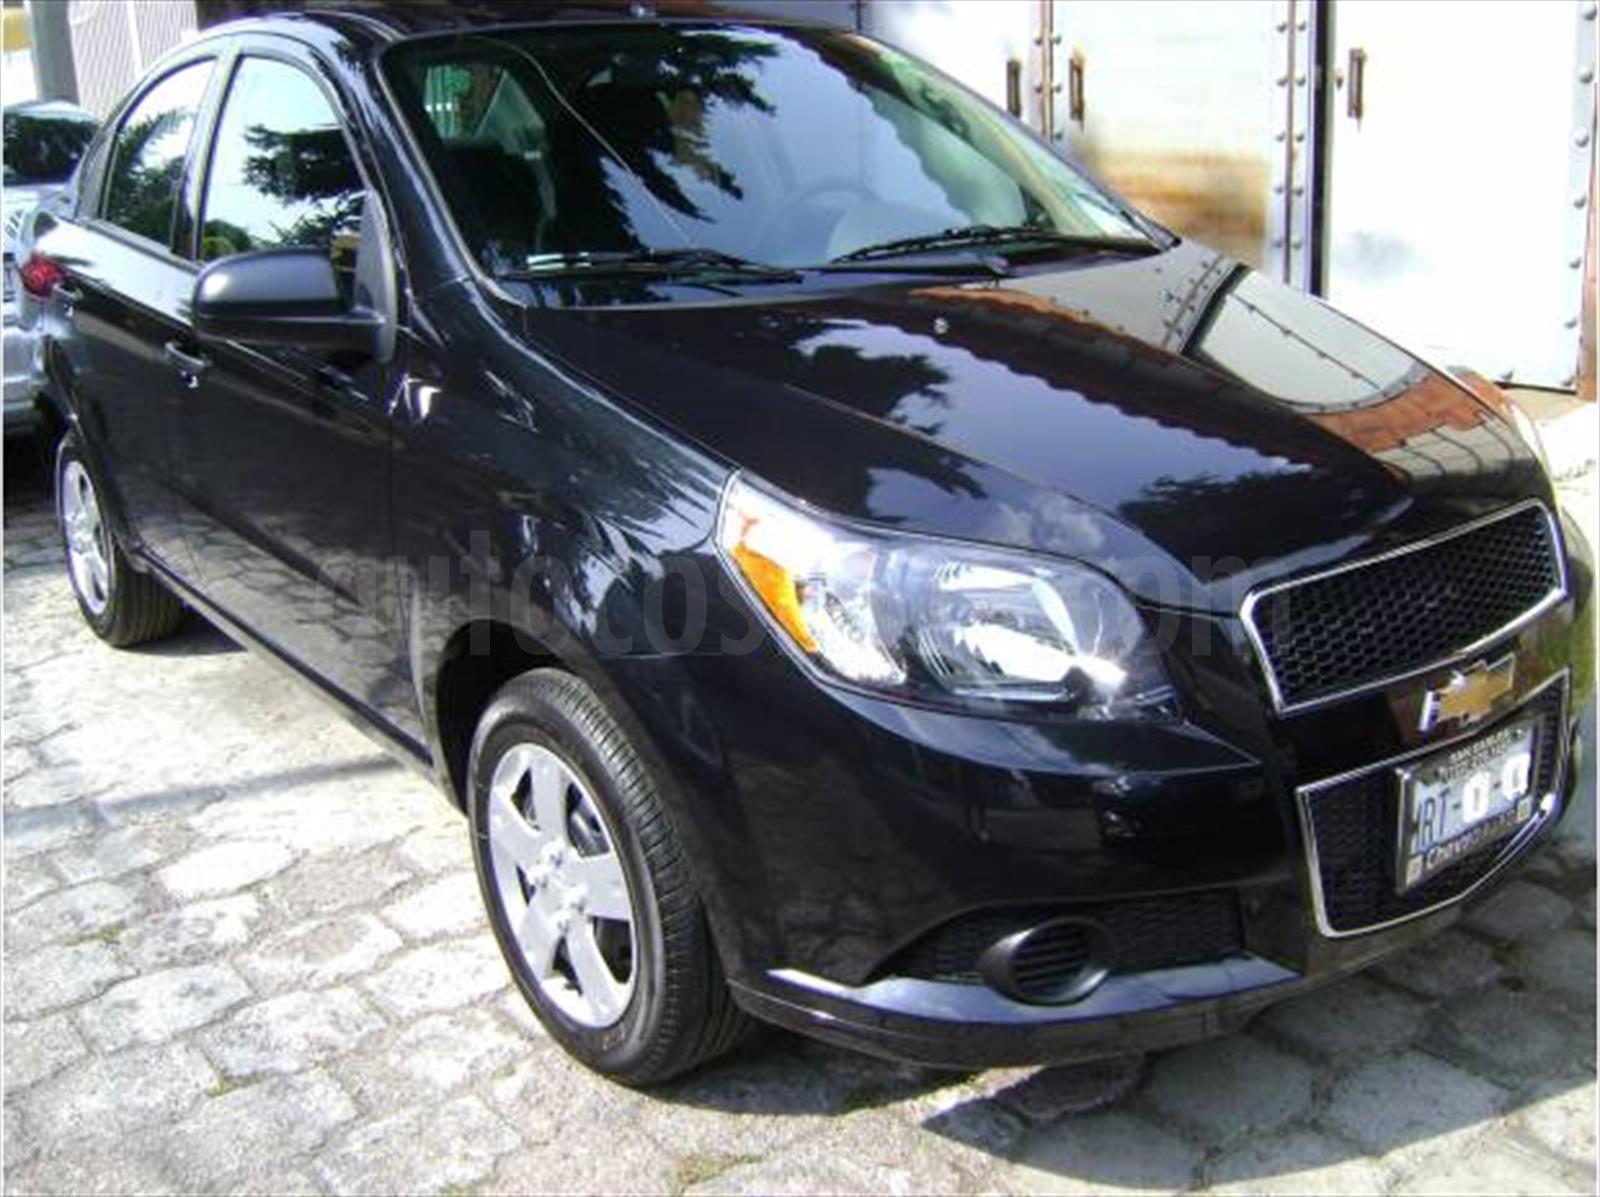 Venta Auto Usado Chevrolet Aveo Paq C 2012 Color Negro